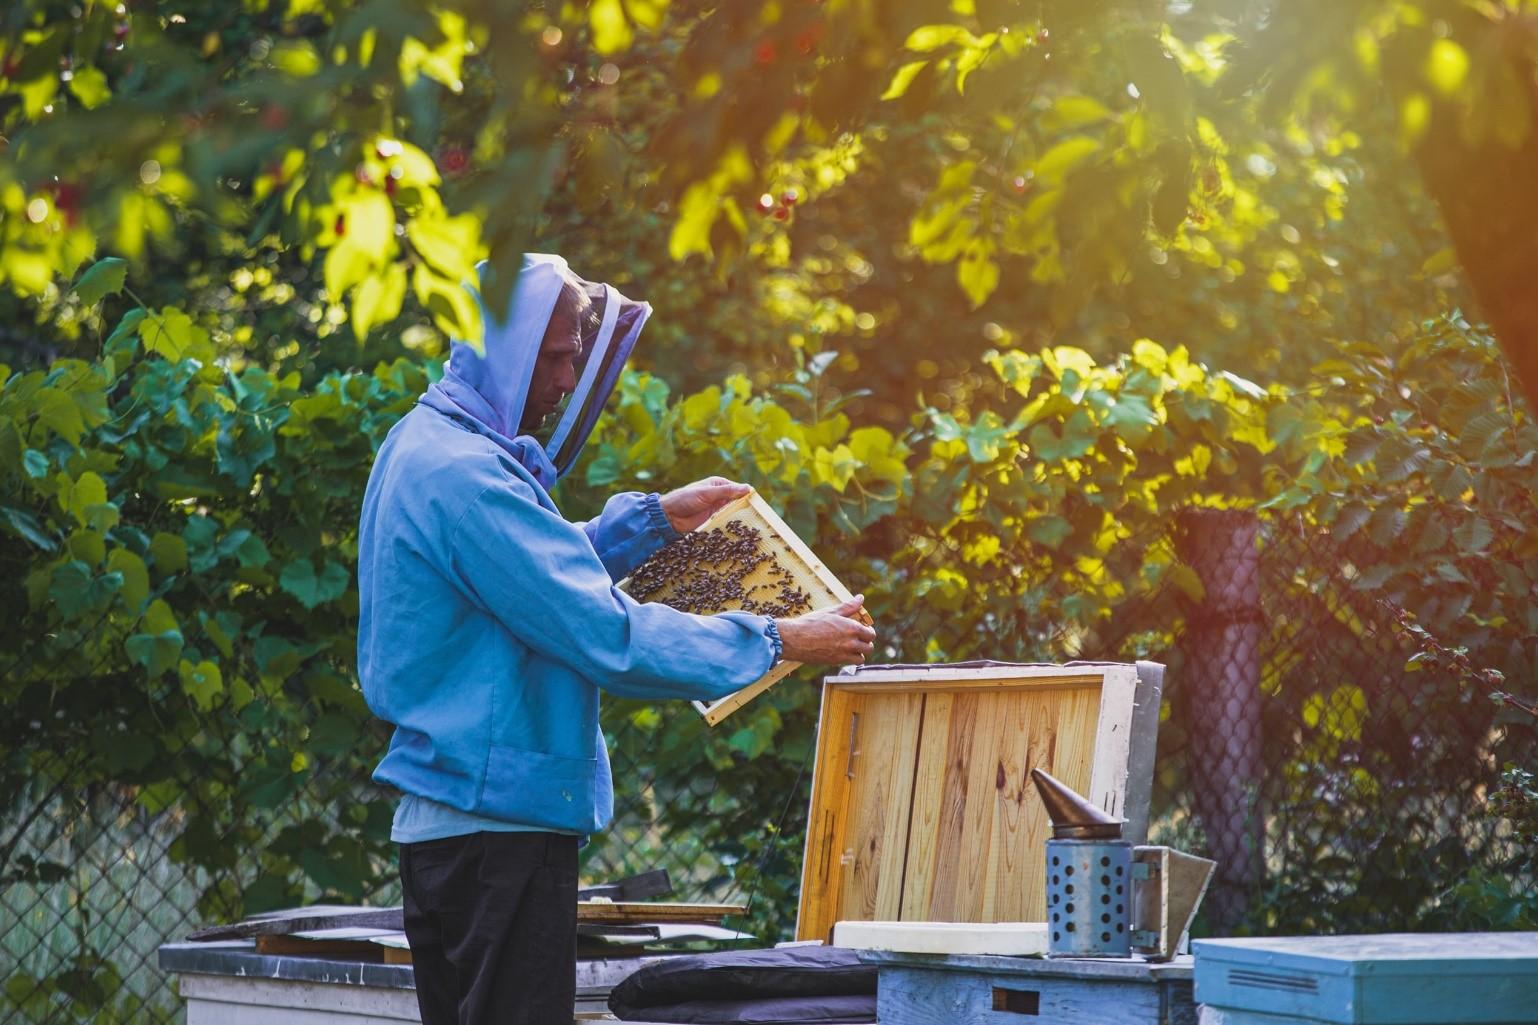 A hobbyist beekeeper examines a hive frame